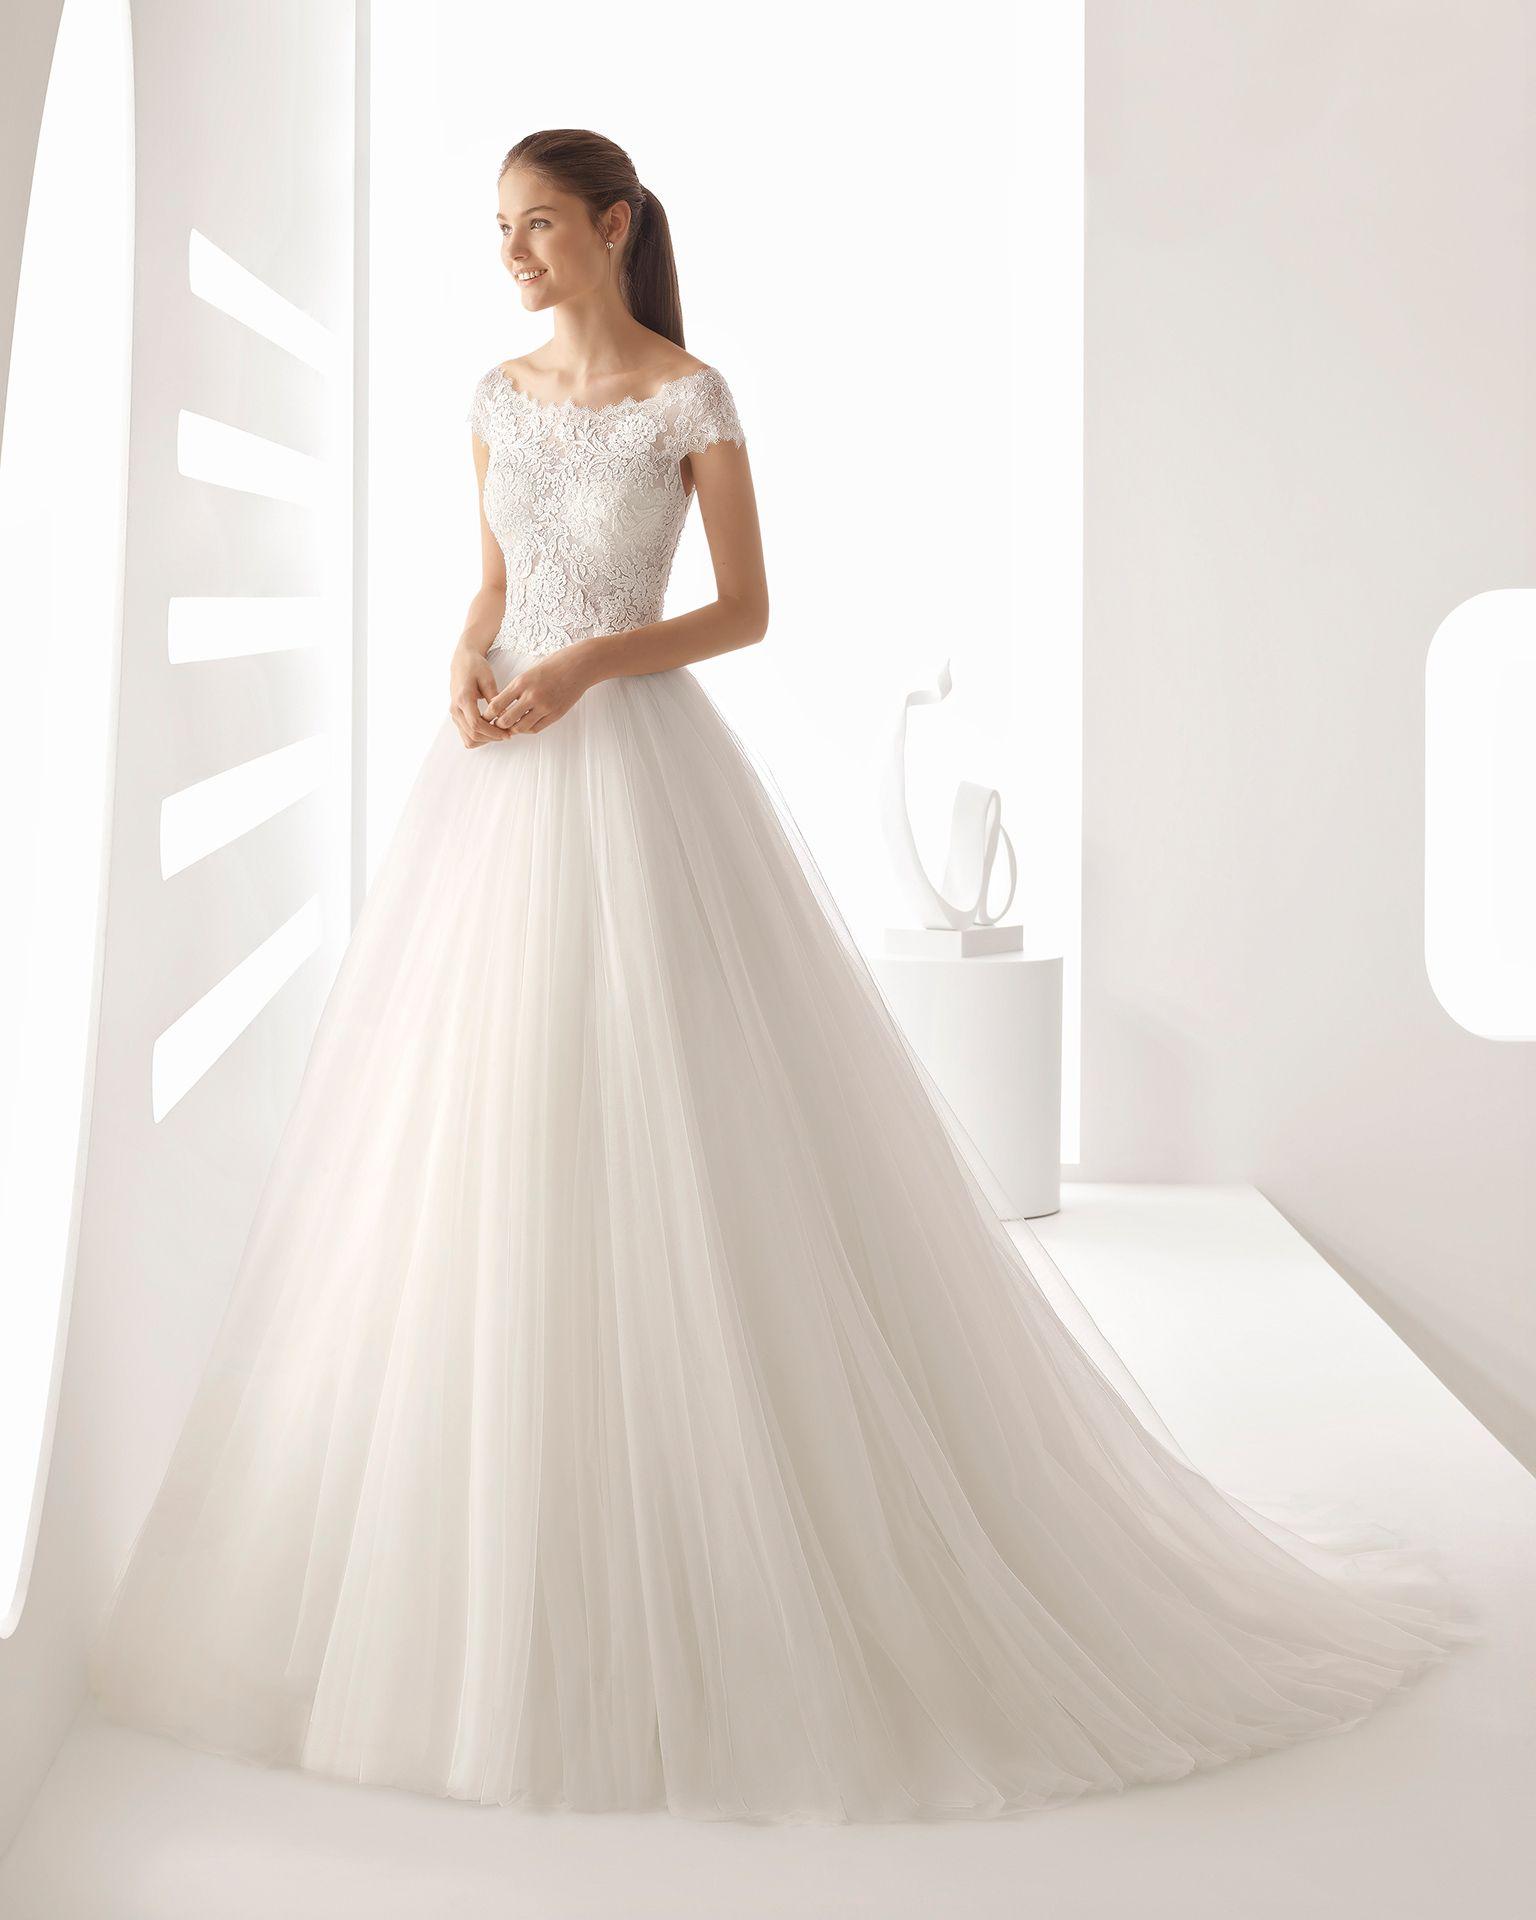 Alejandra mariée collection princess style beaded lace